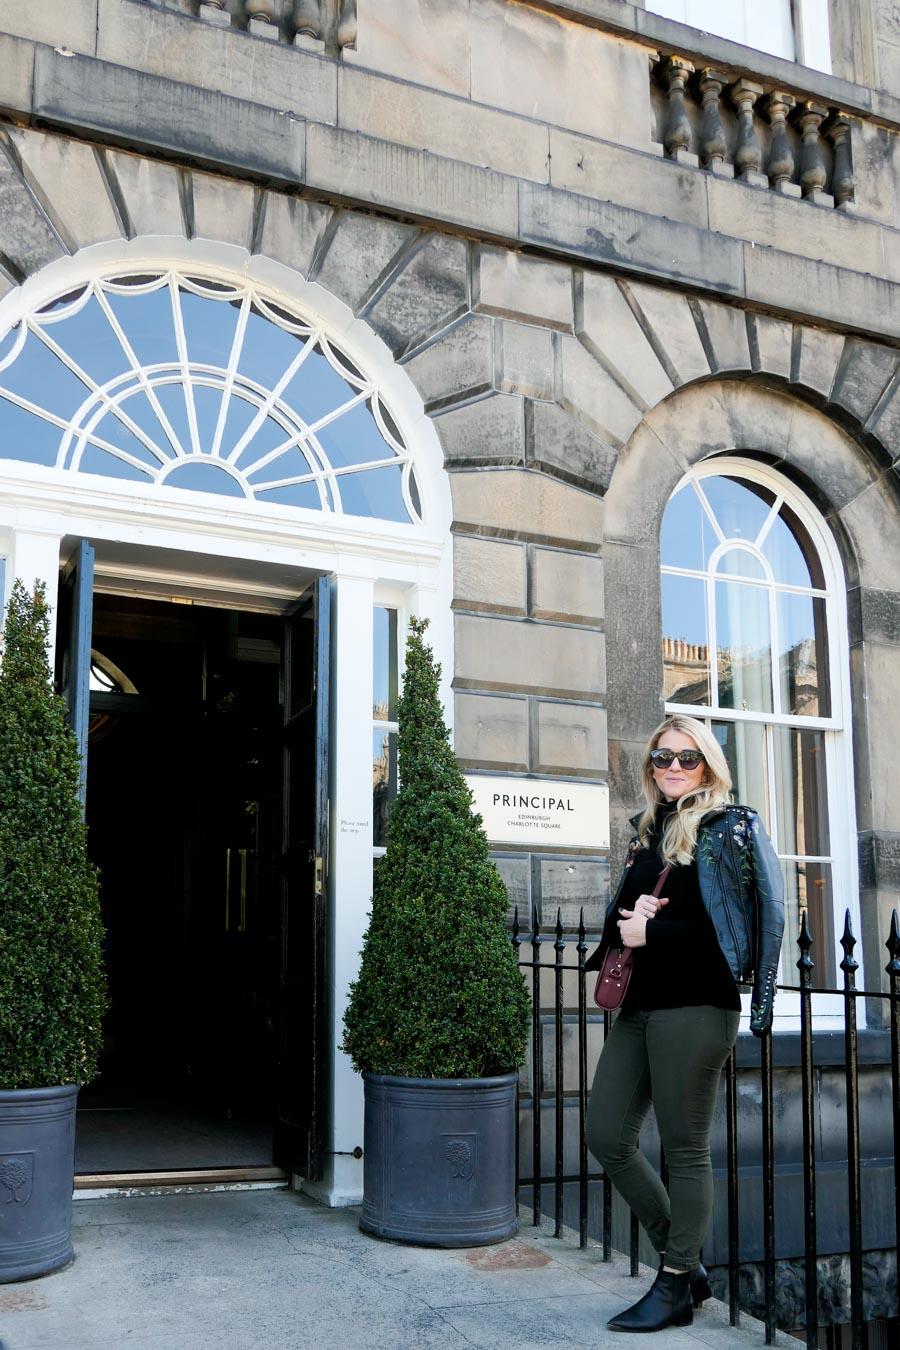 Where to Stay in Edinburgh - The Principal Edinburgh Review